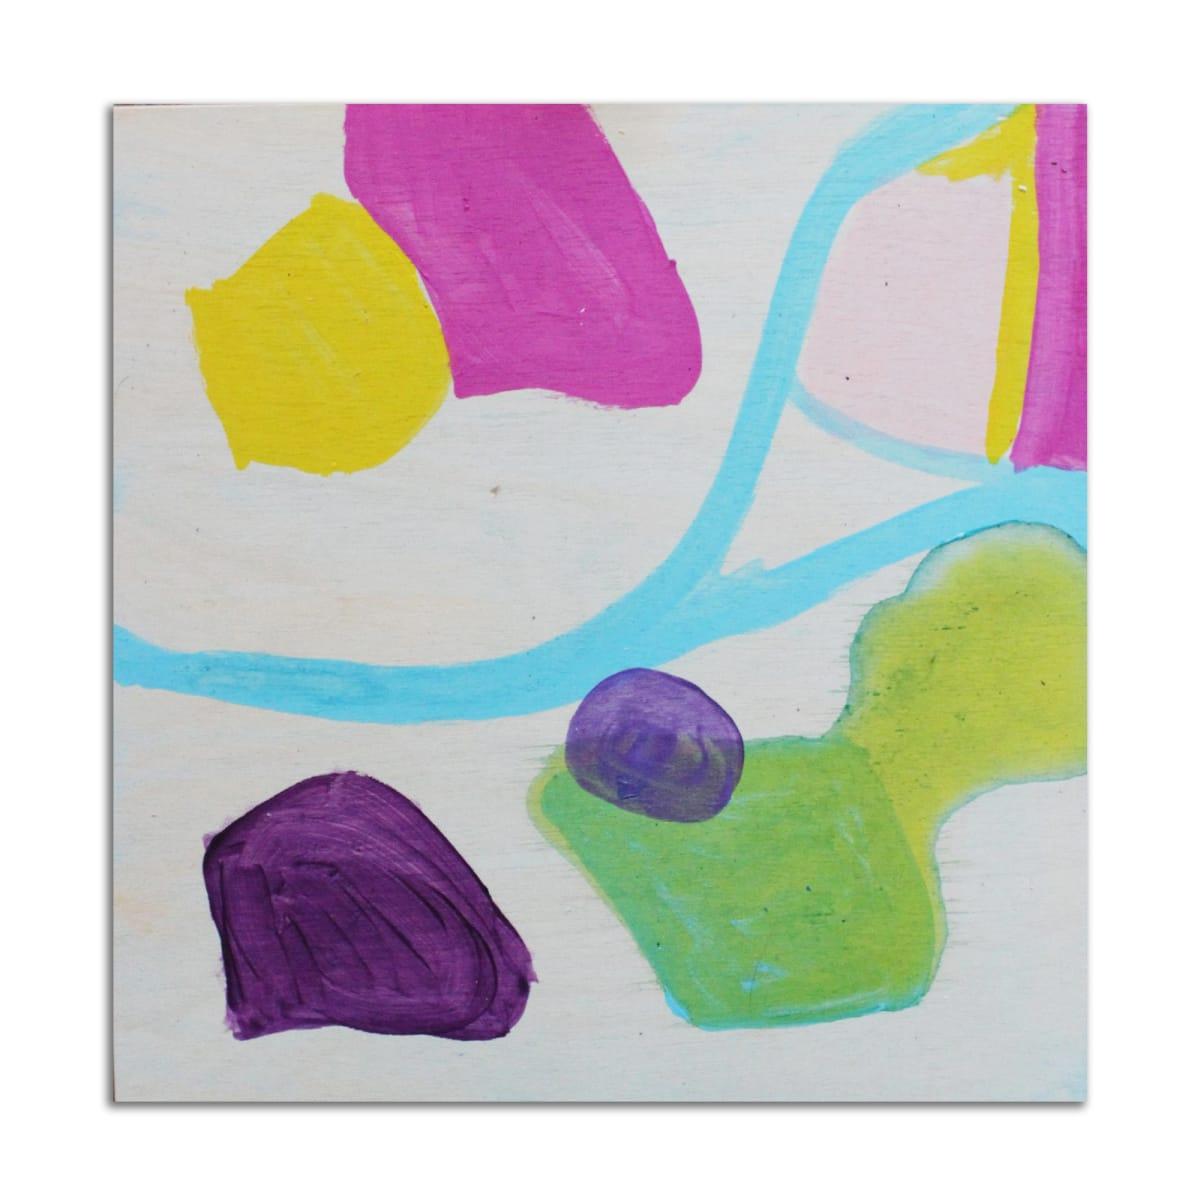 Salt Pond II by Meganne Rosen